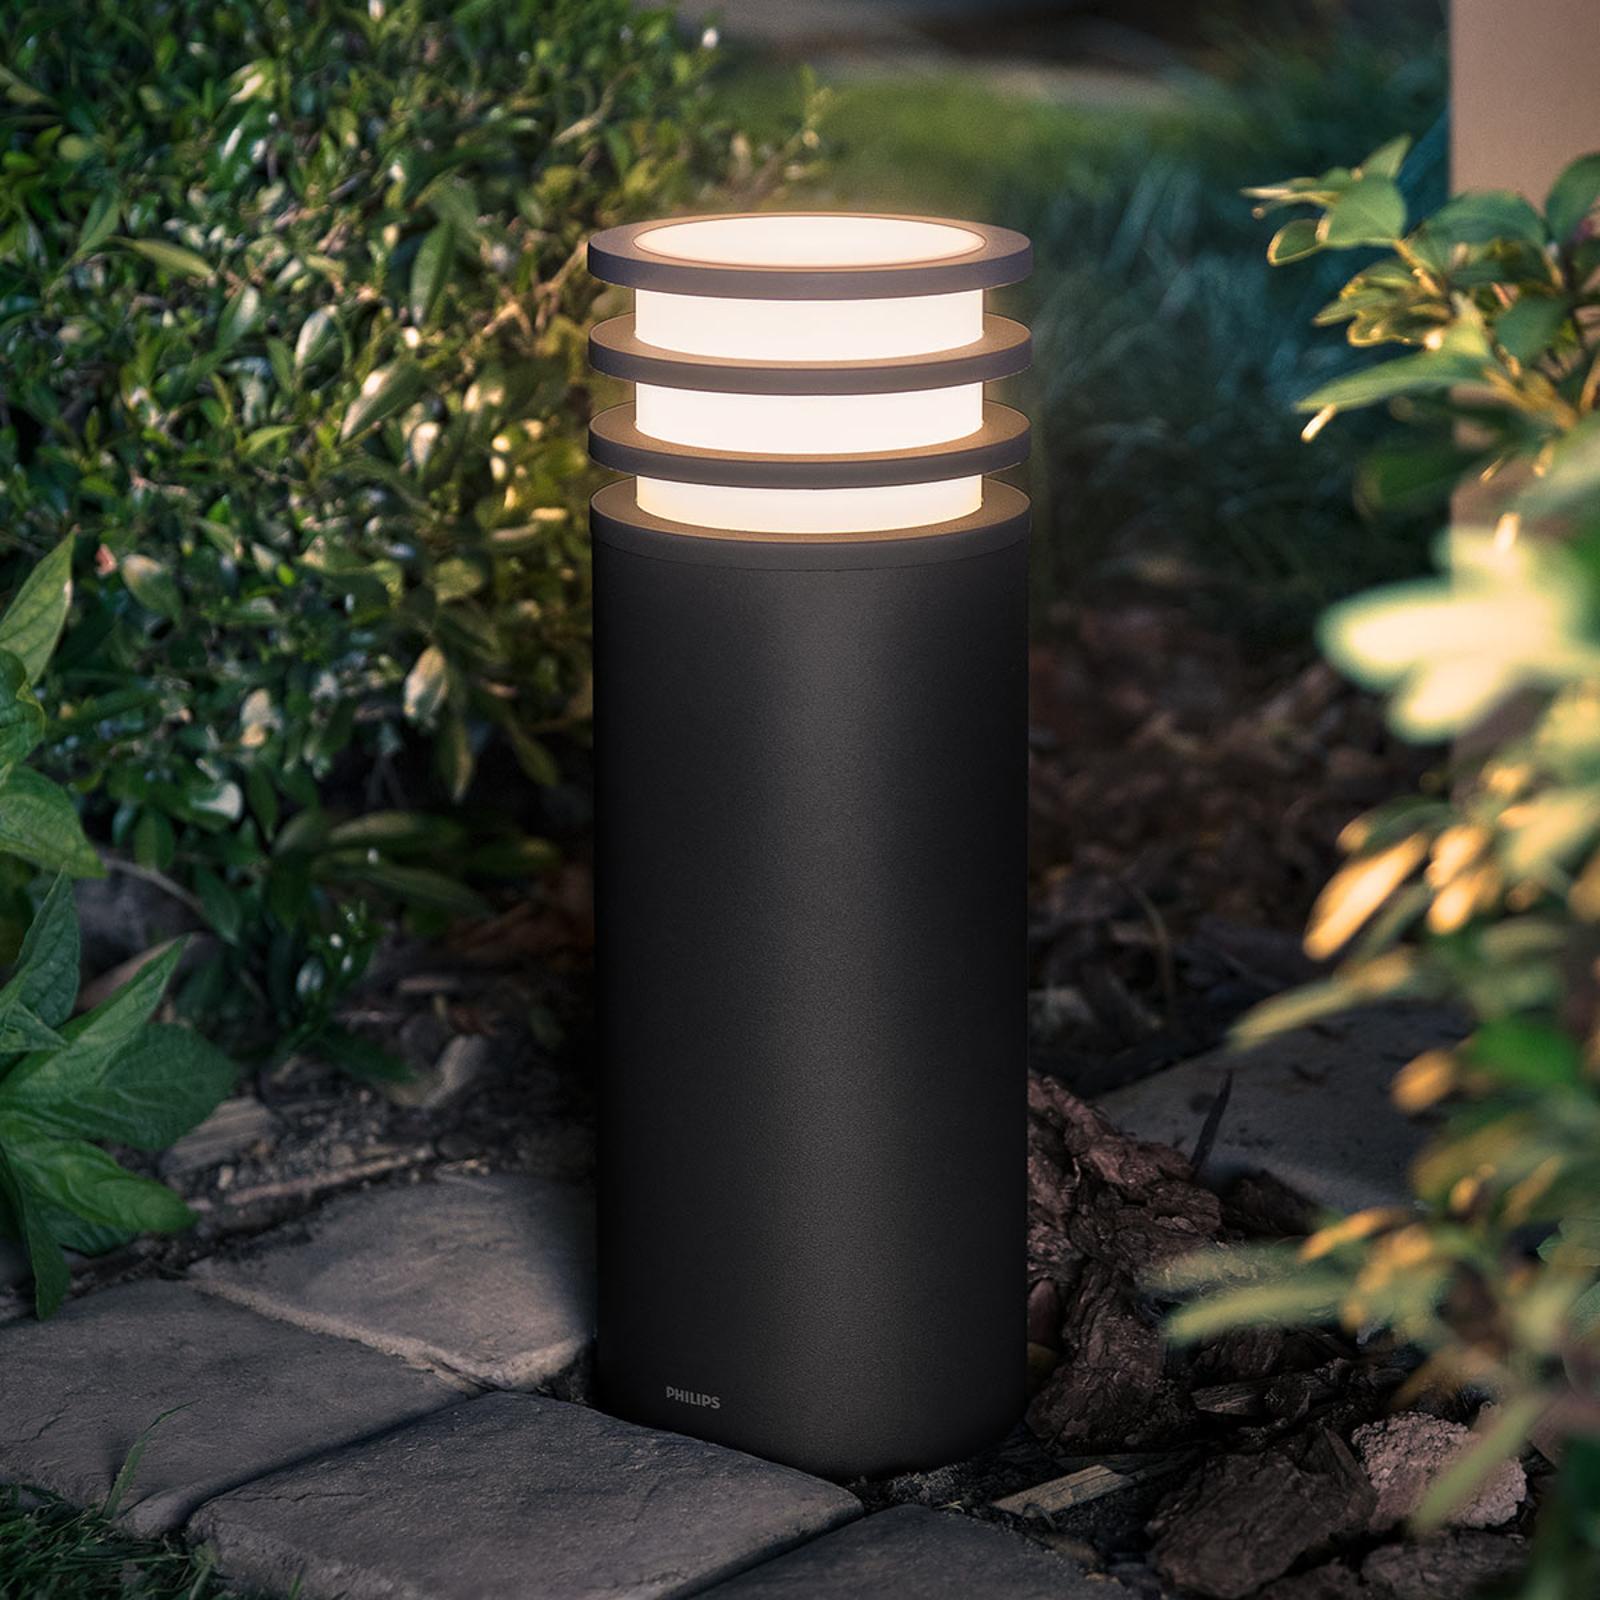 Philips Hue White Lucca LED-Sockellampe steuerbar